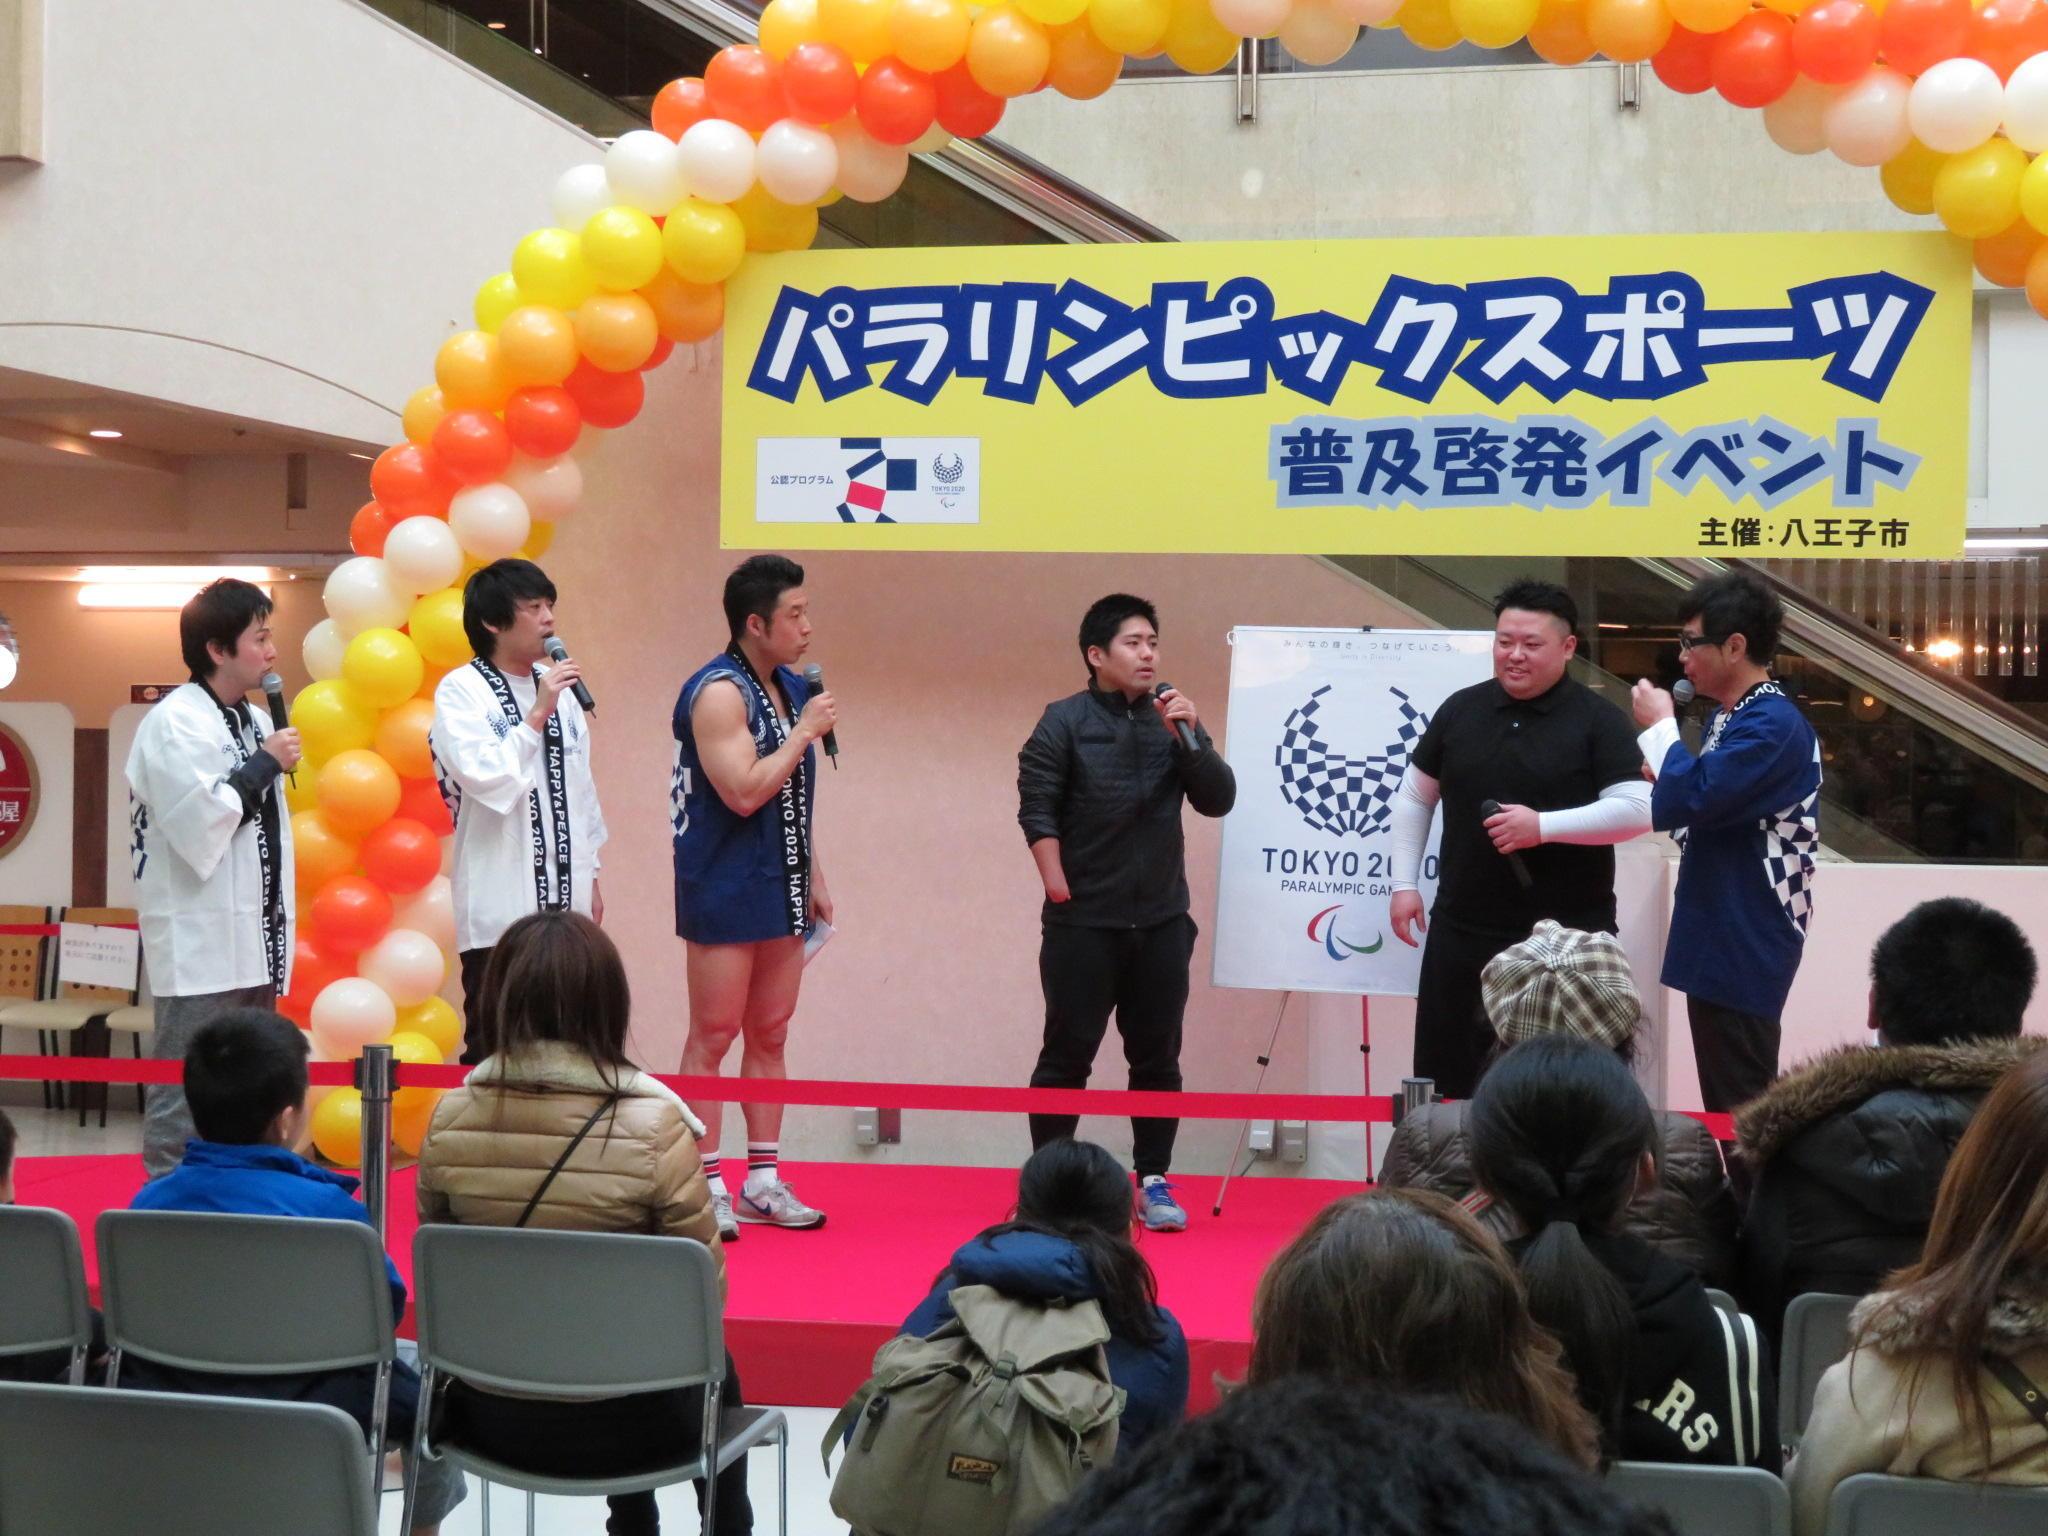 http://news.yoshimoto.co.jp/20180206131408-0c71ea422a1cc0bde19e620d7541c307bb7c9e08.jpg